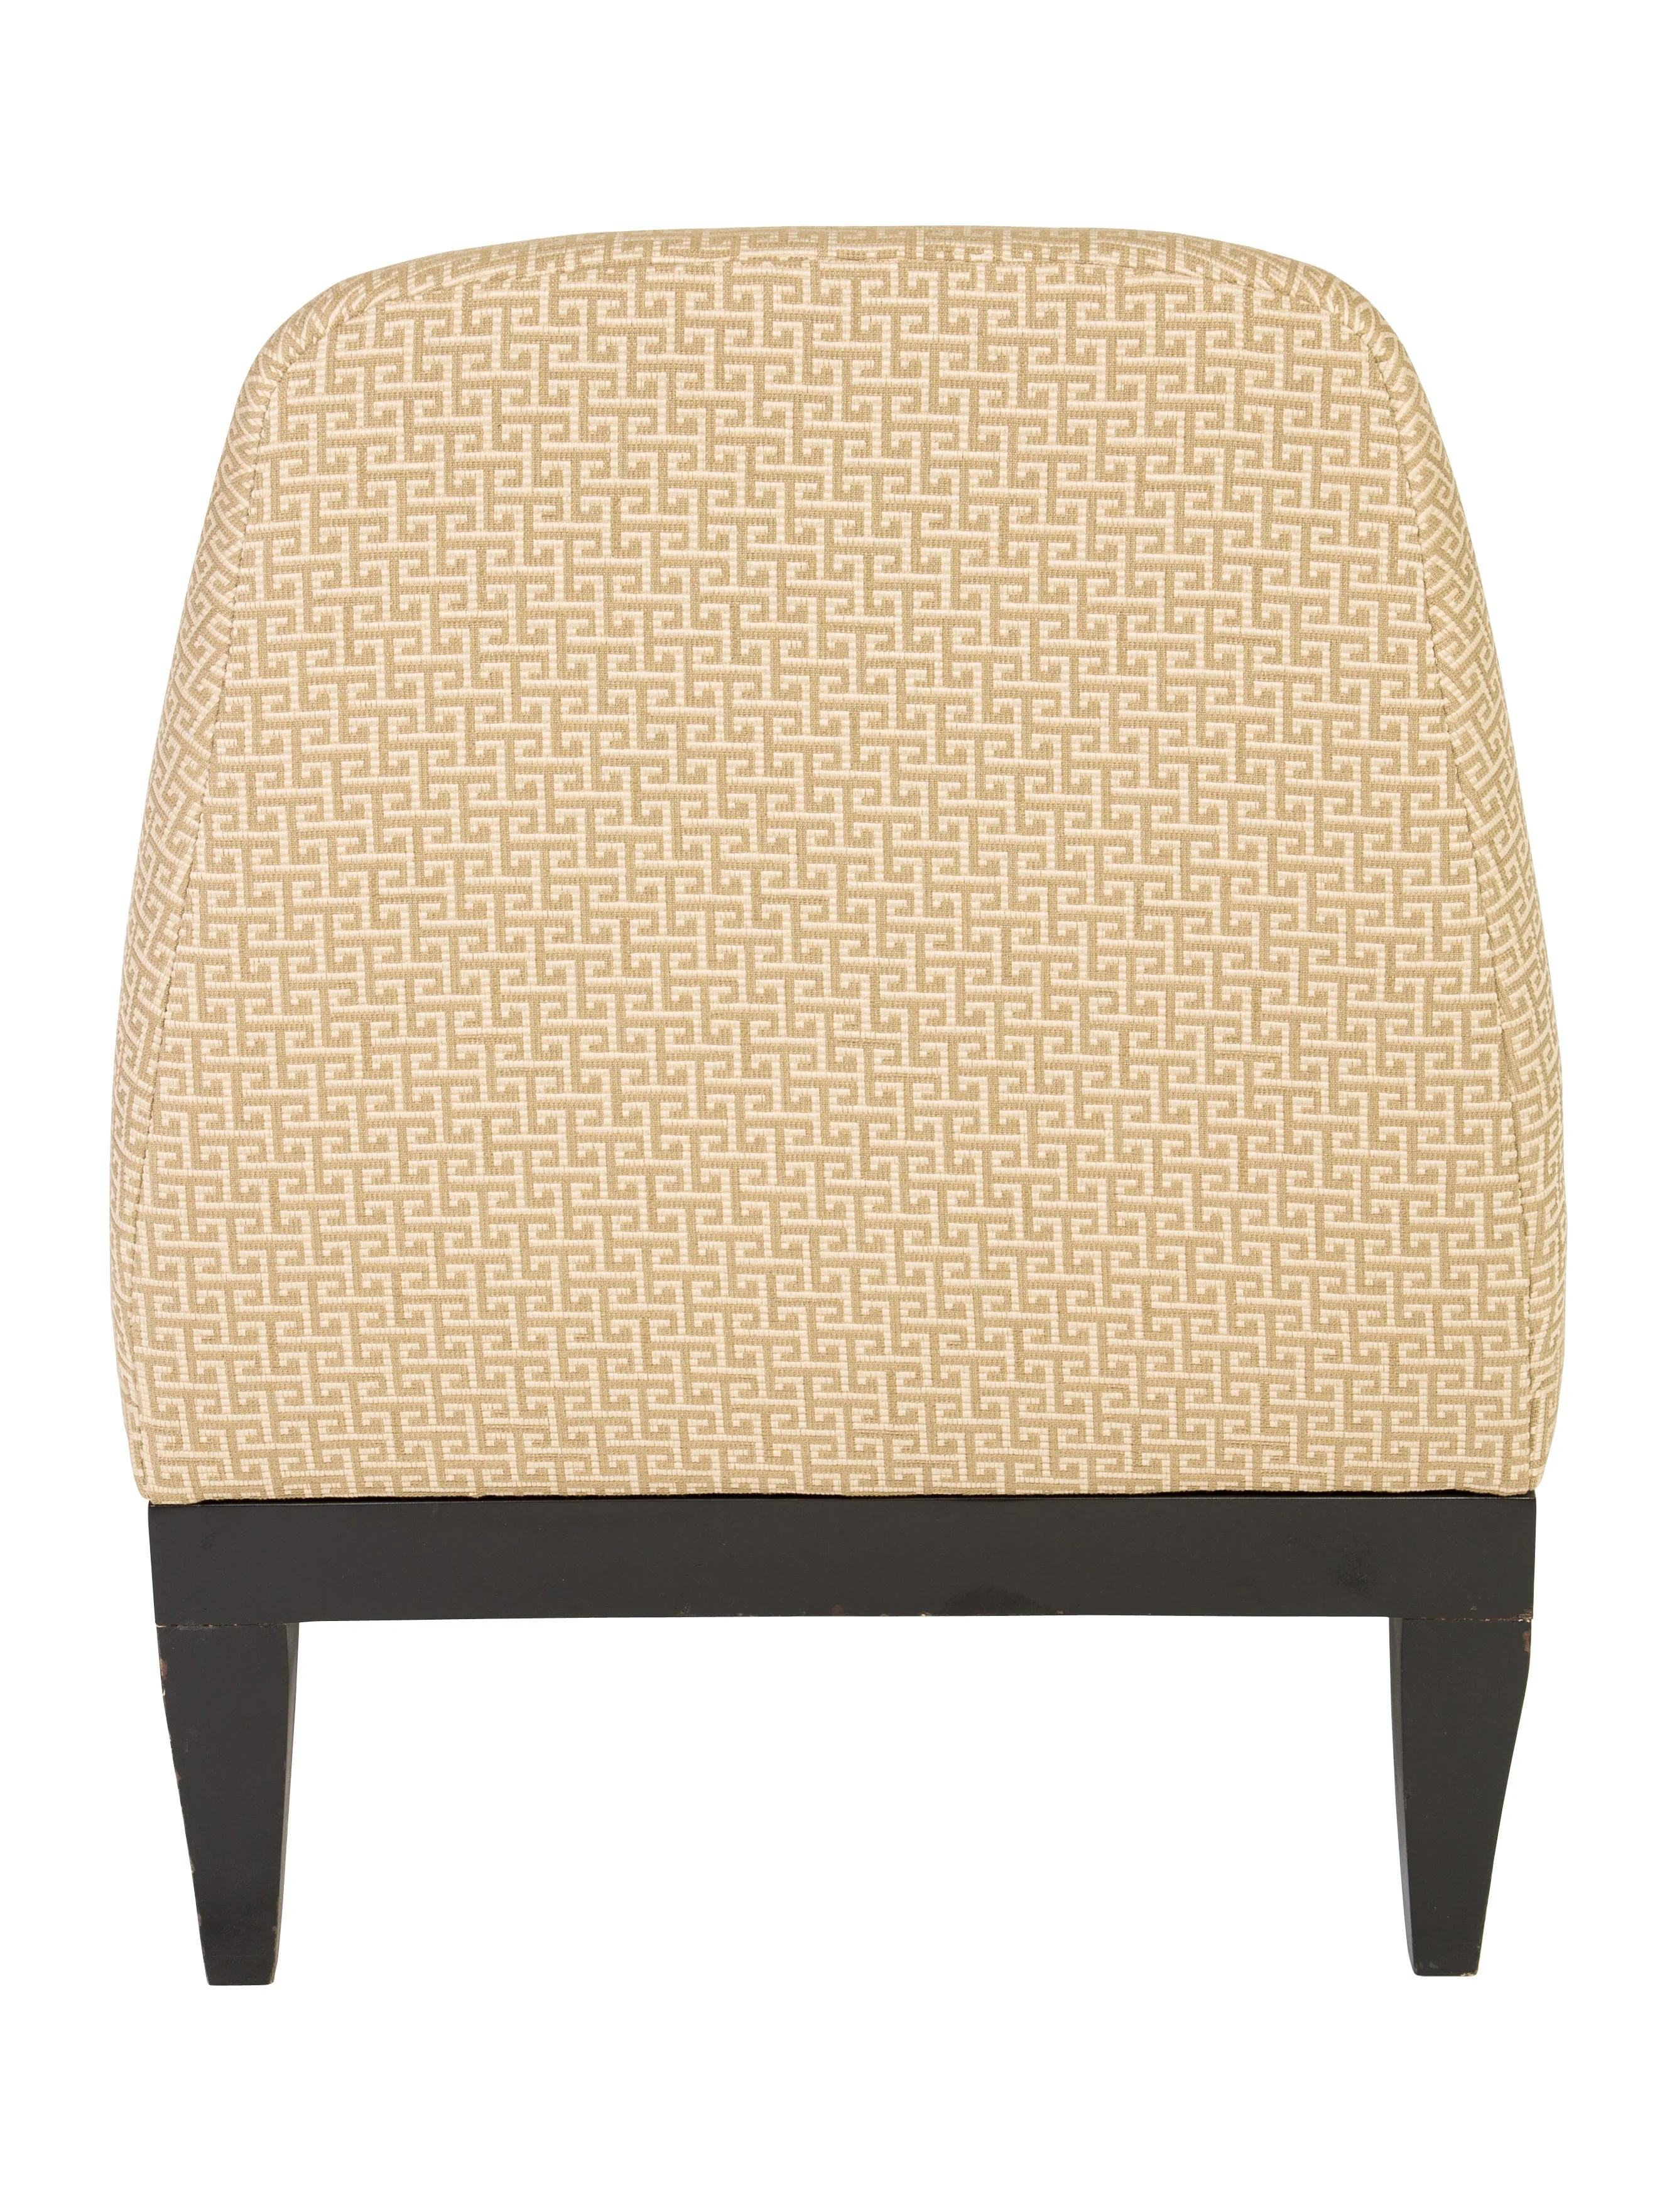 upholstered slipper chair lucite office on wheels raul carrasco furniture